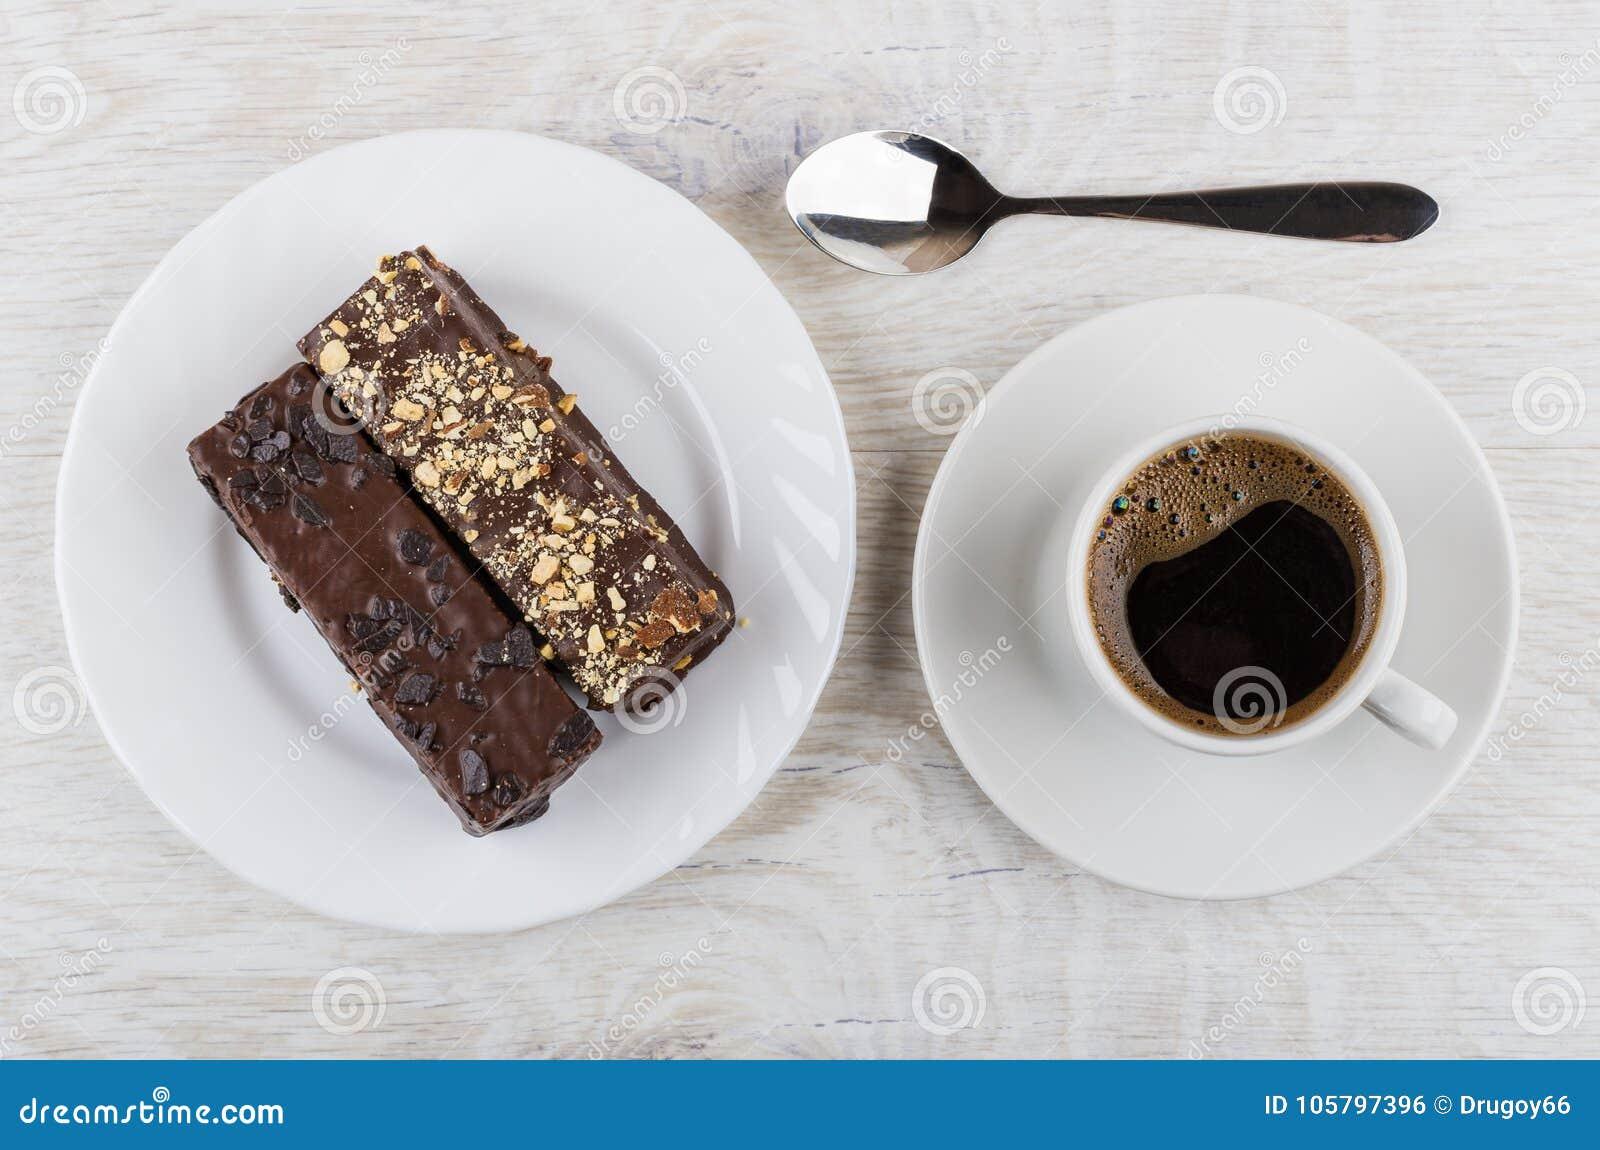 Zwarte koffie in kop, chocoladewafeltje in plaat en lepel